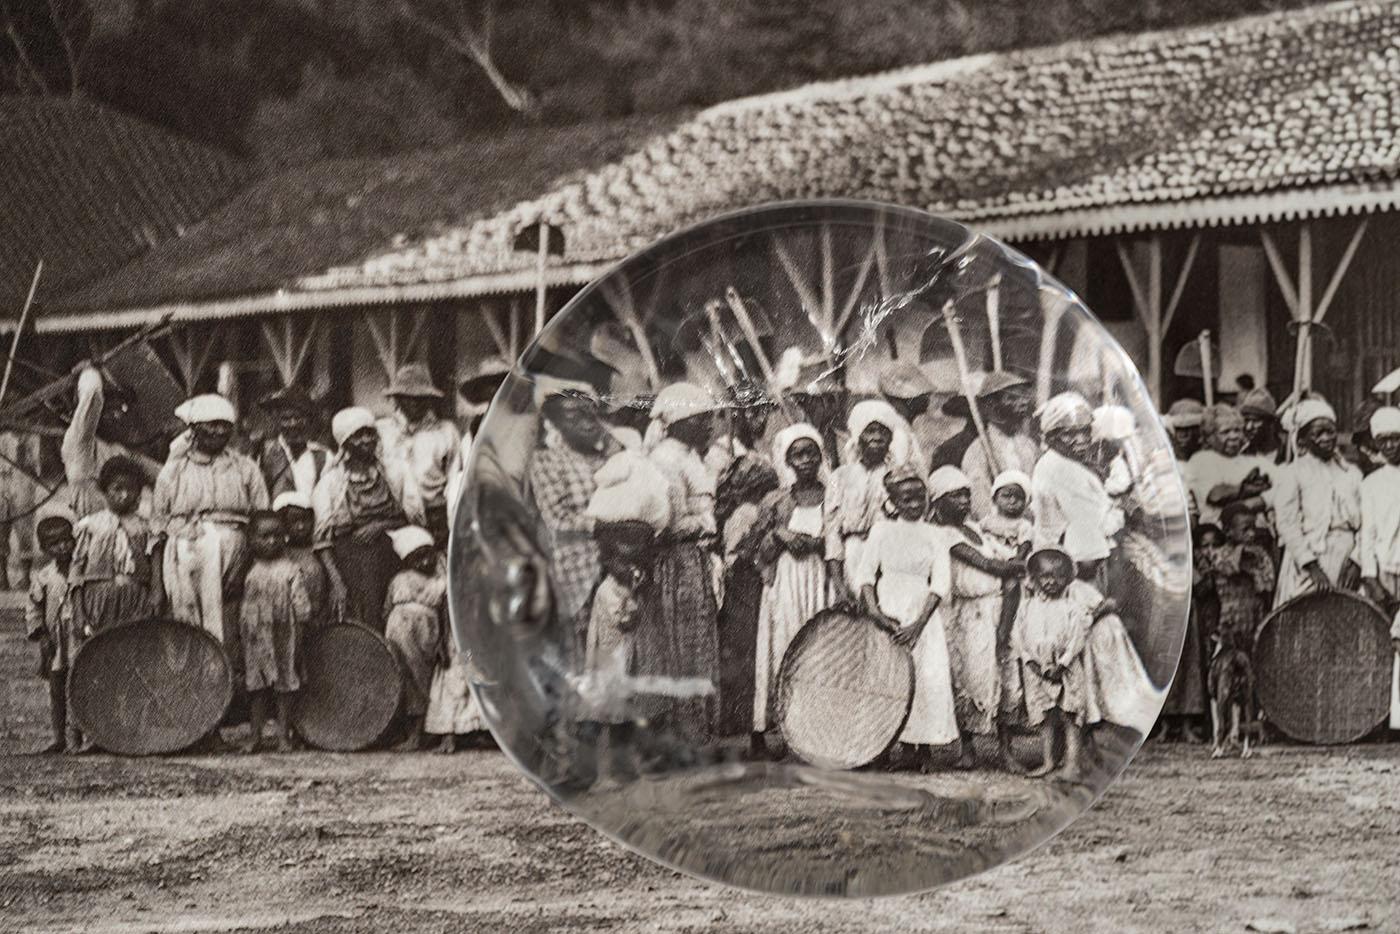 Modos de OlhMãe Preta (Black Mother): Exhibition recovers history of black womenar, 2016